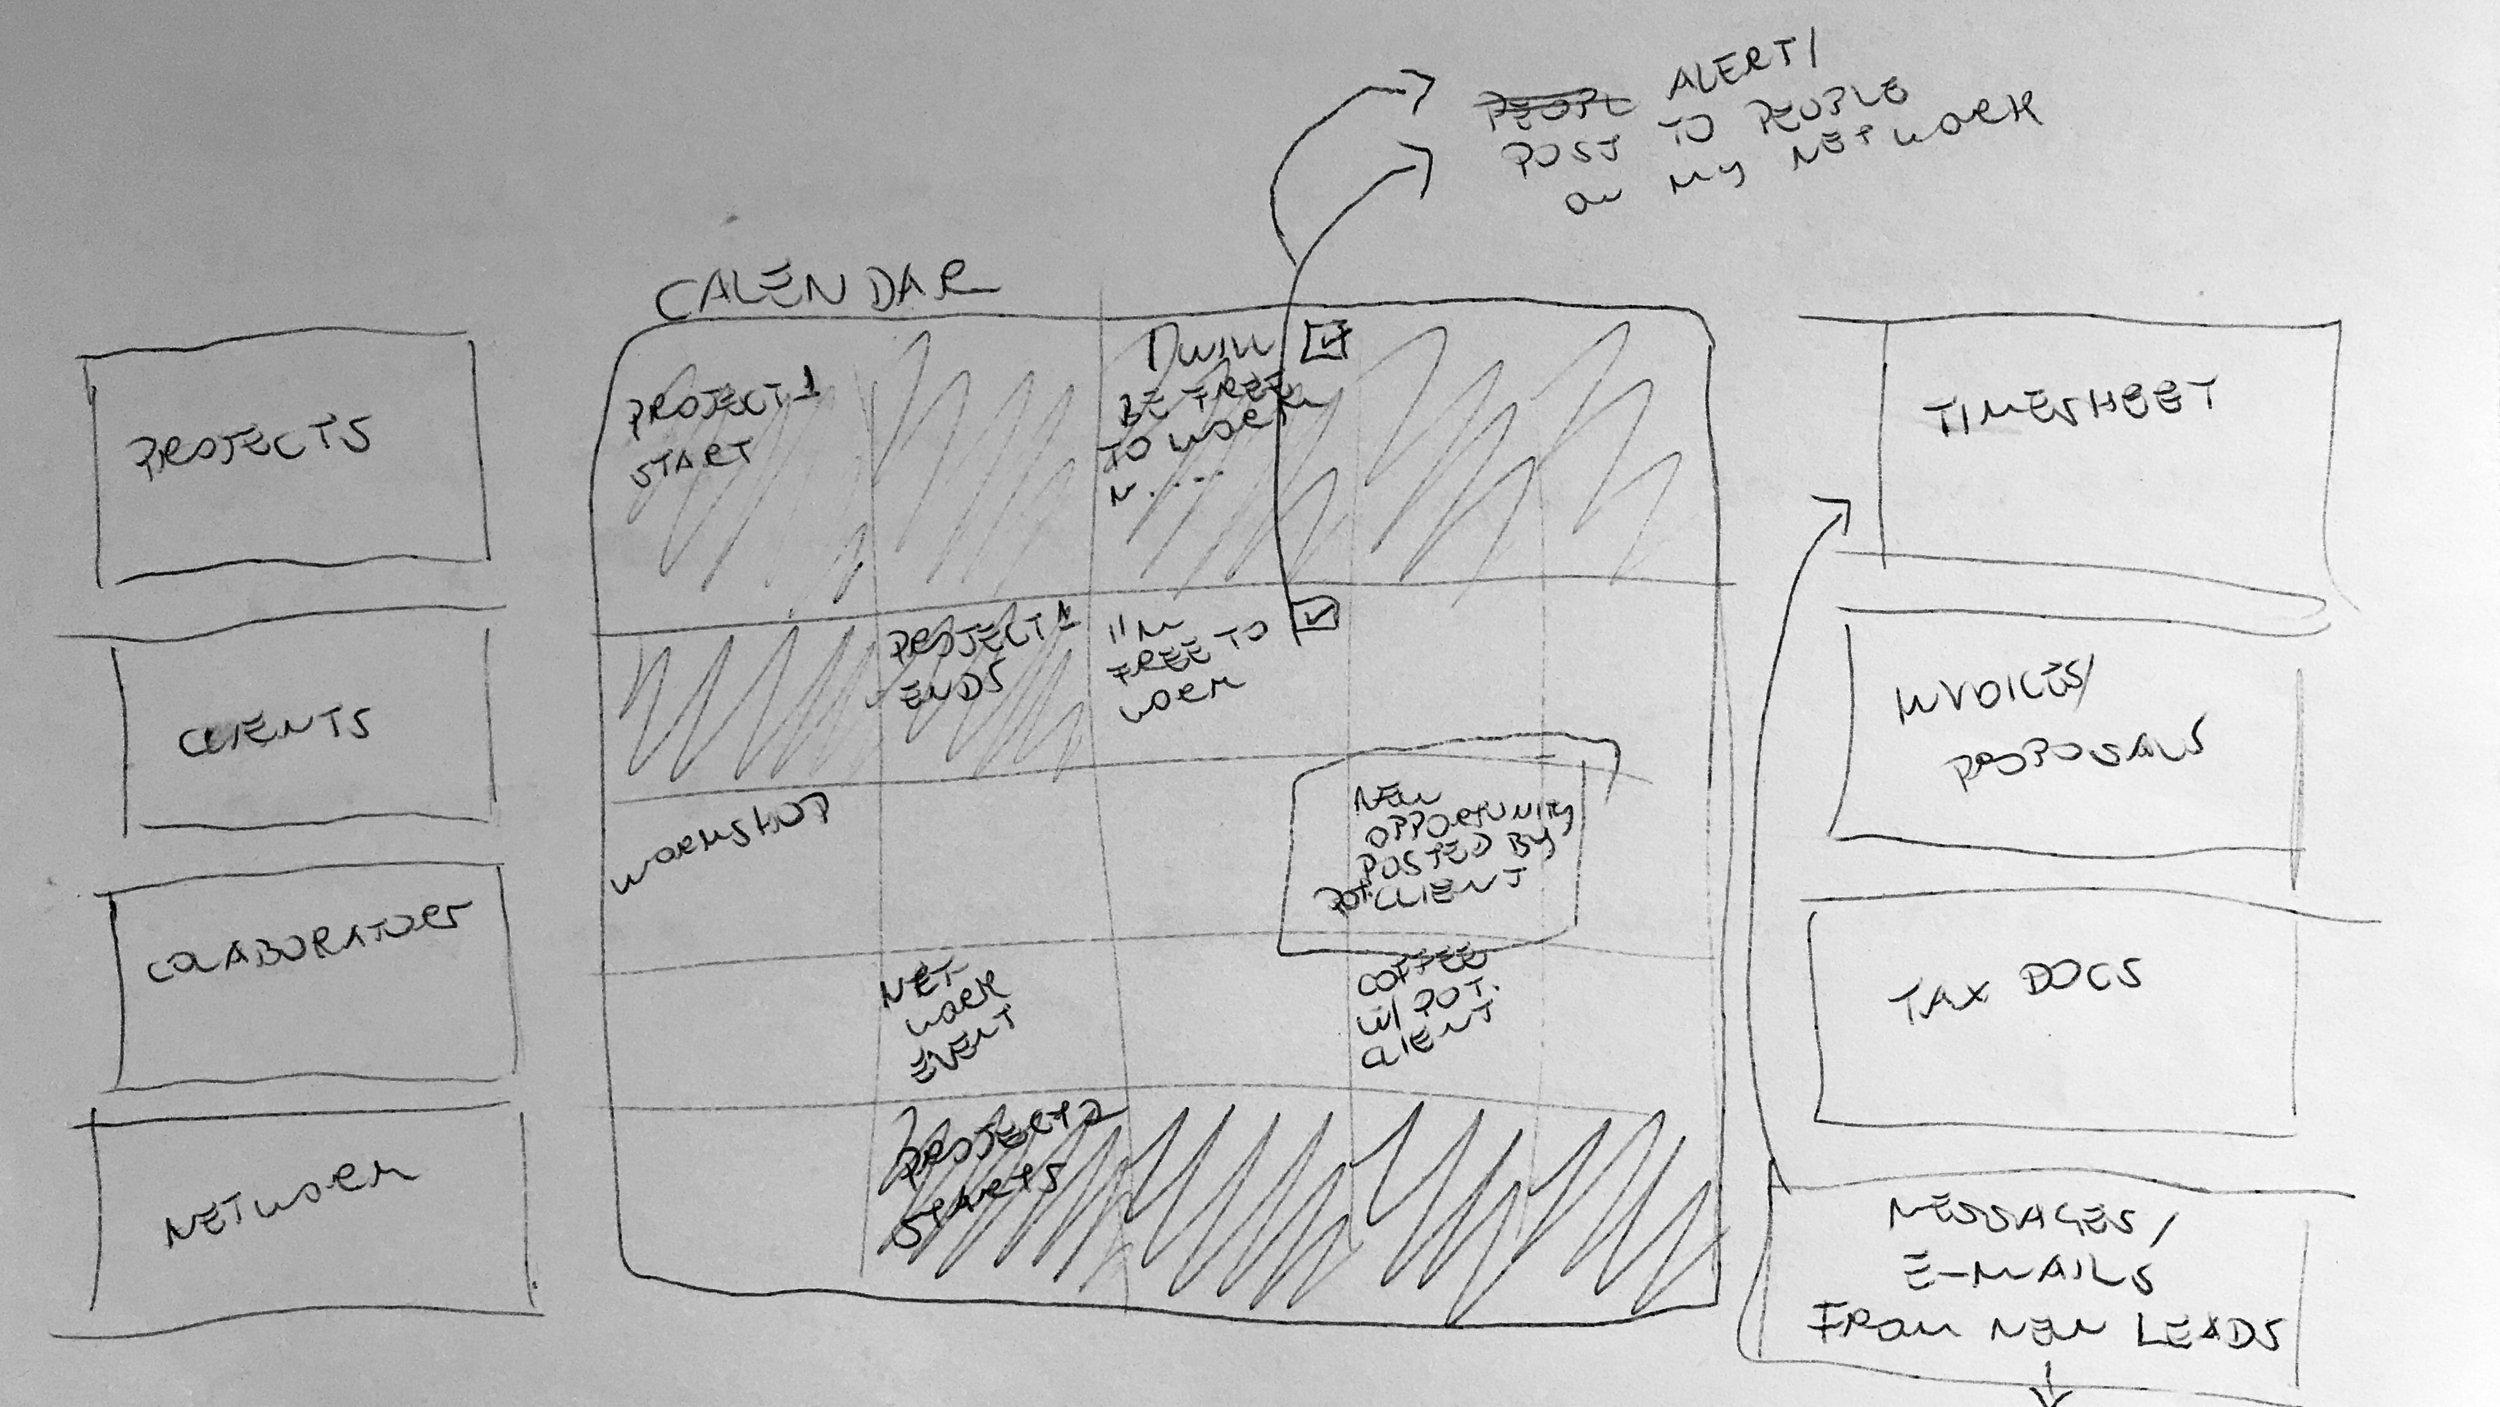 Sketch of calendar/home screen idea